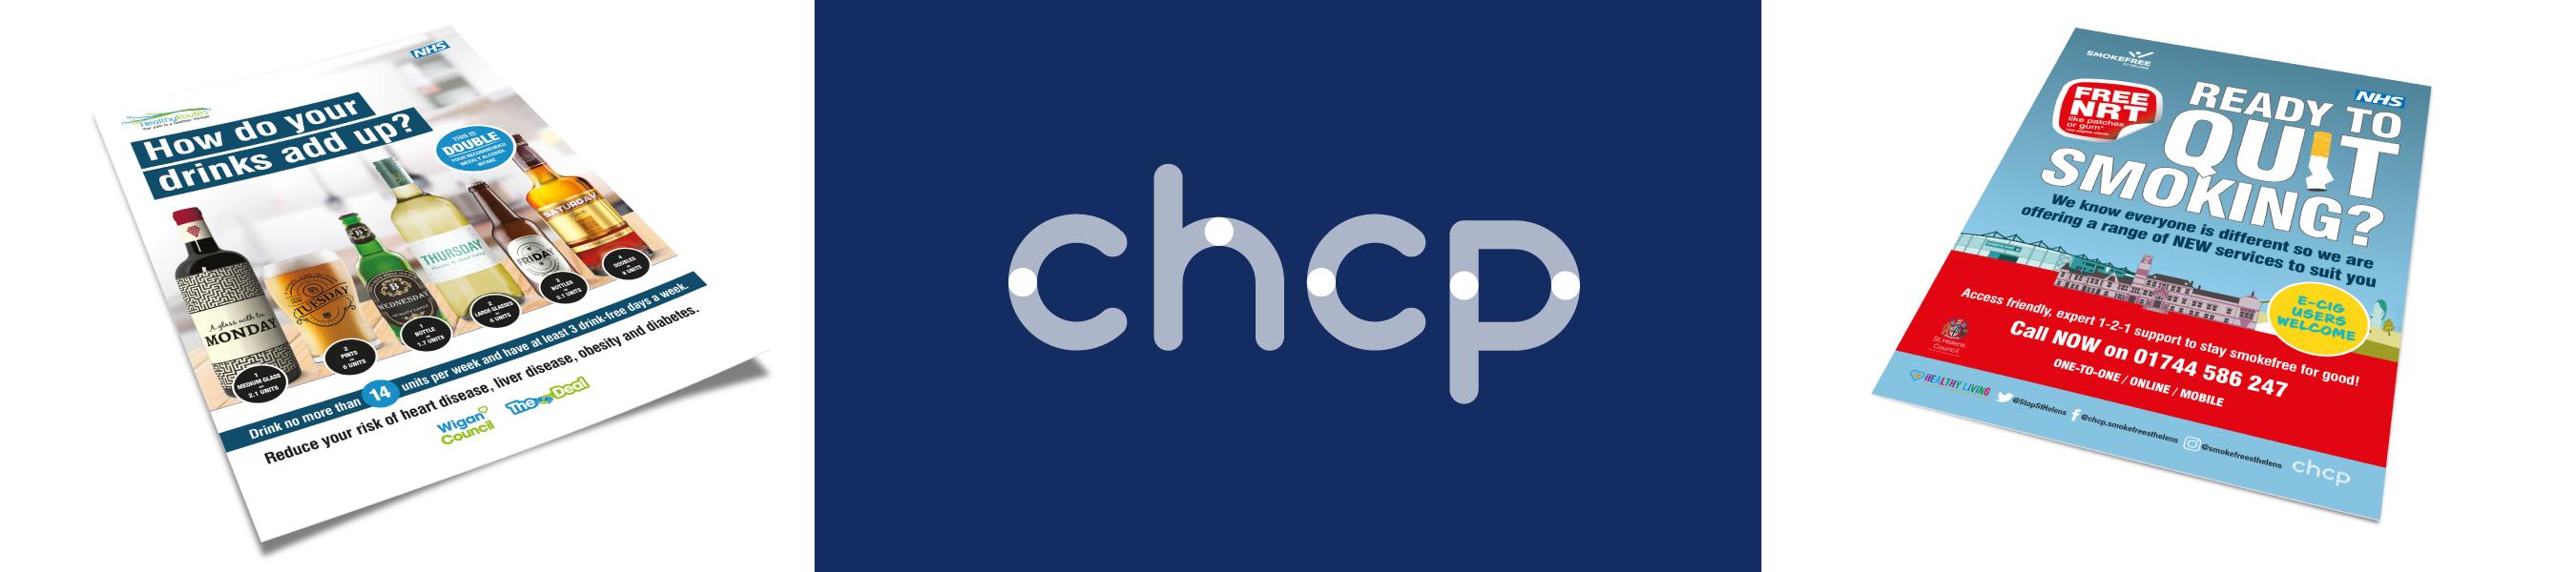 chcp_website_portfolio_image